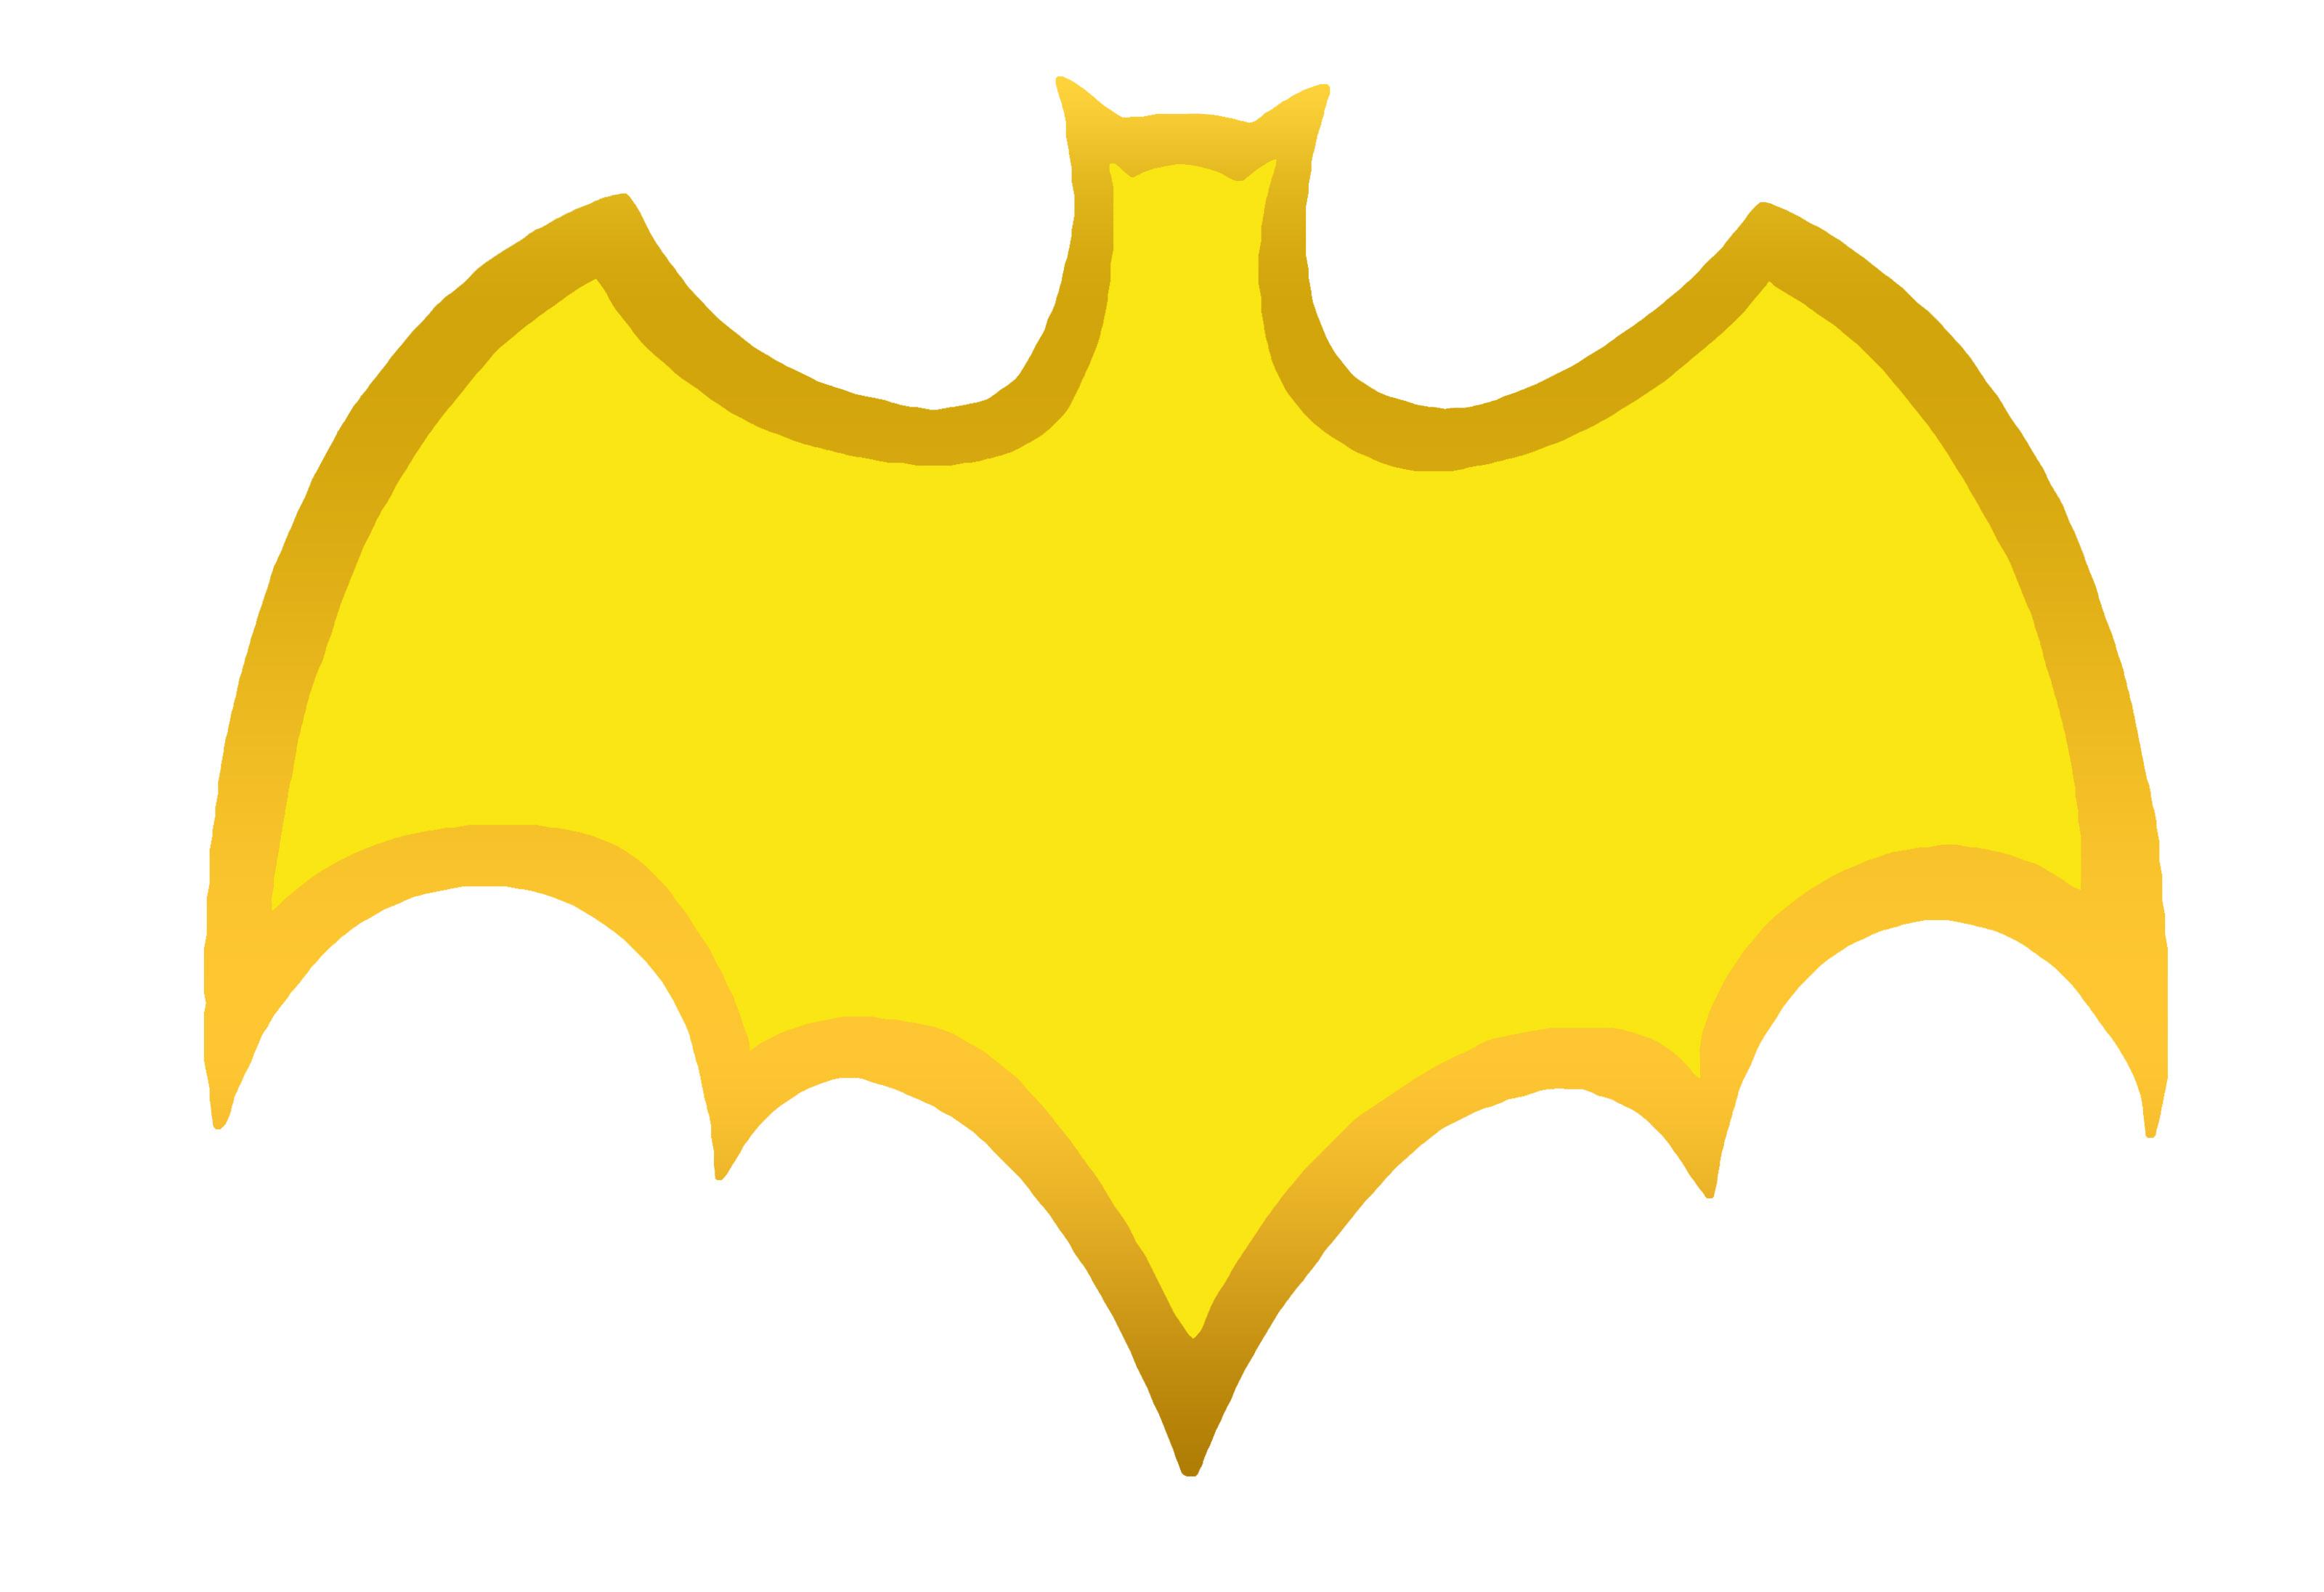 Batman insignia template clipart free download best batman 3200x2192 logo clipart batgirl buycottarizona